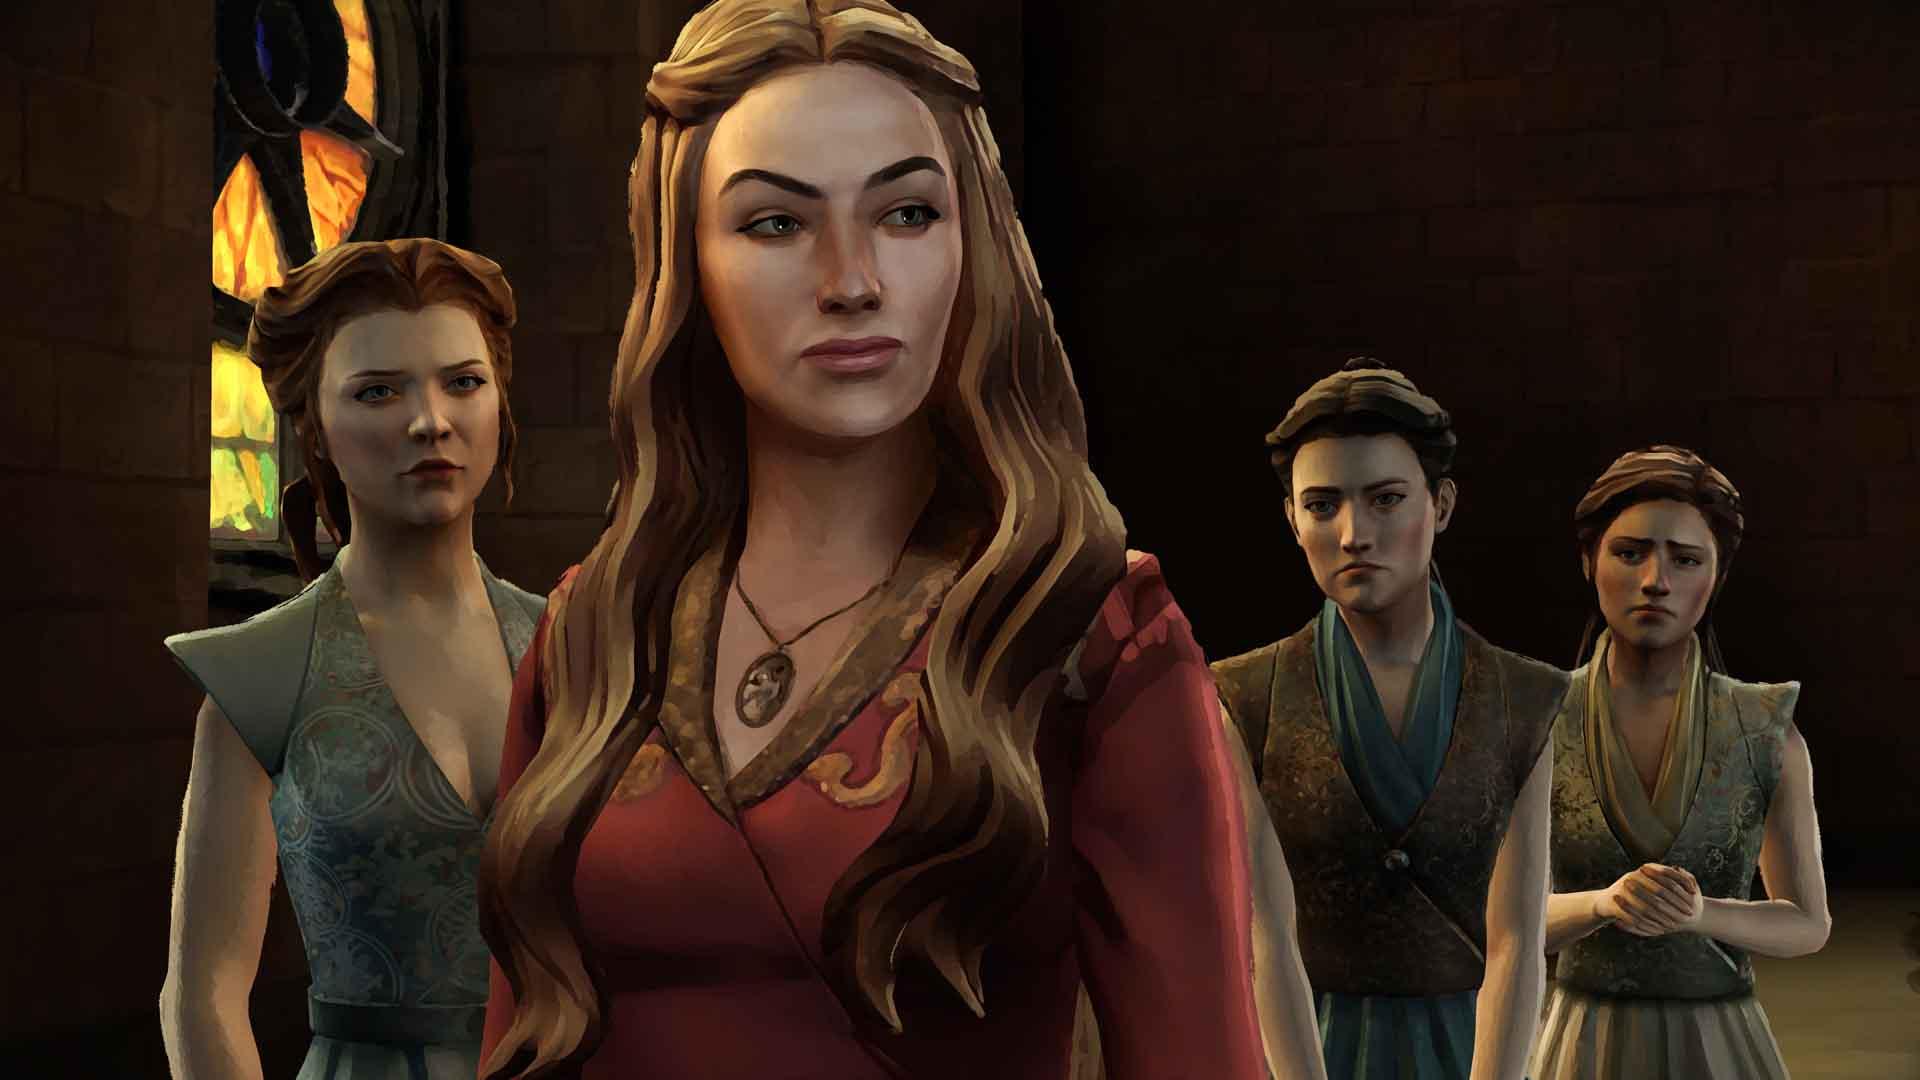 Game-of-Thrones-A-Telltale-Game-4.jpg